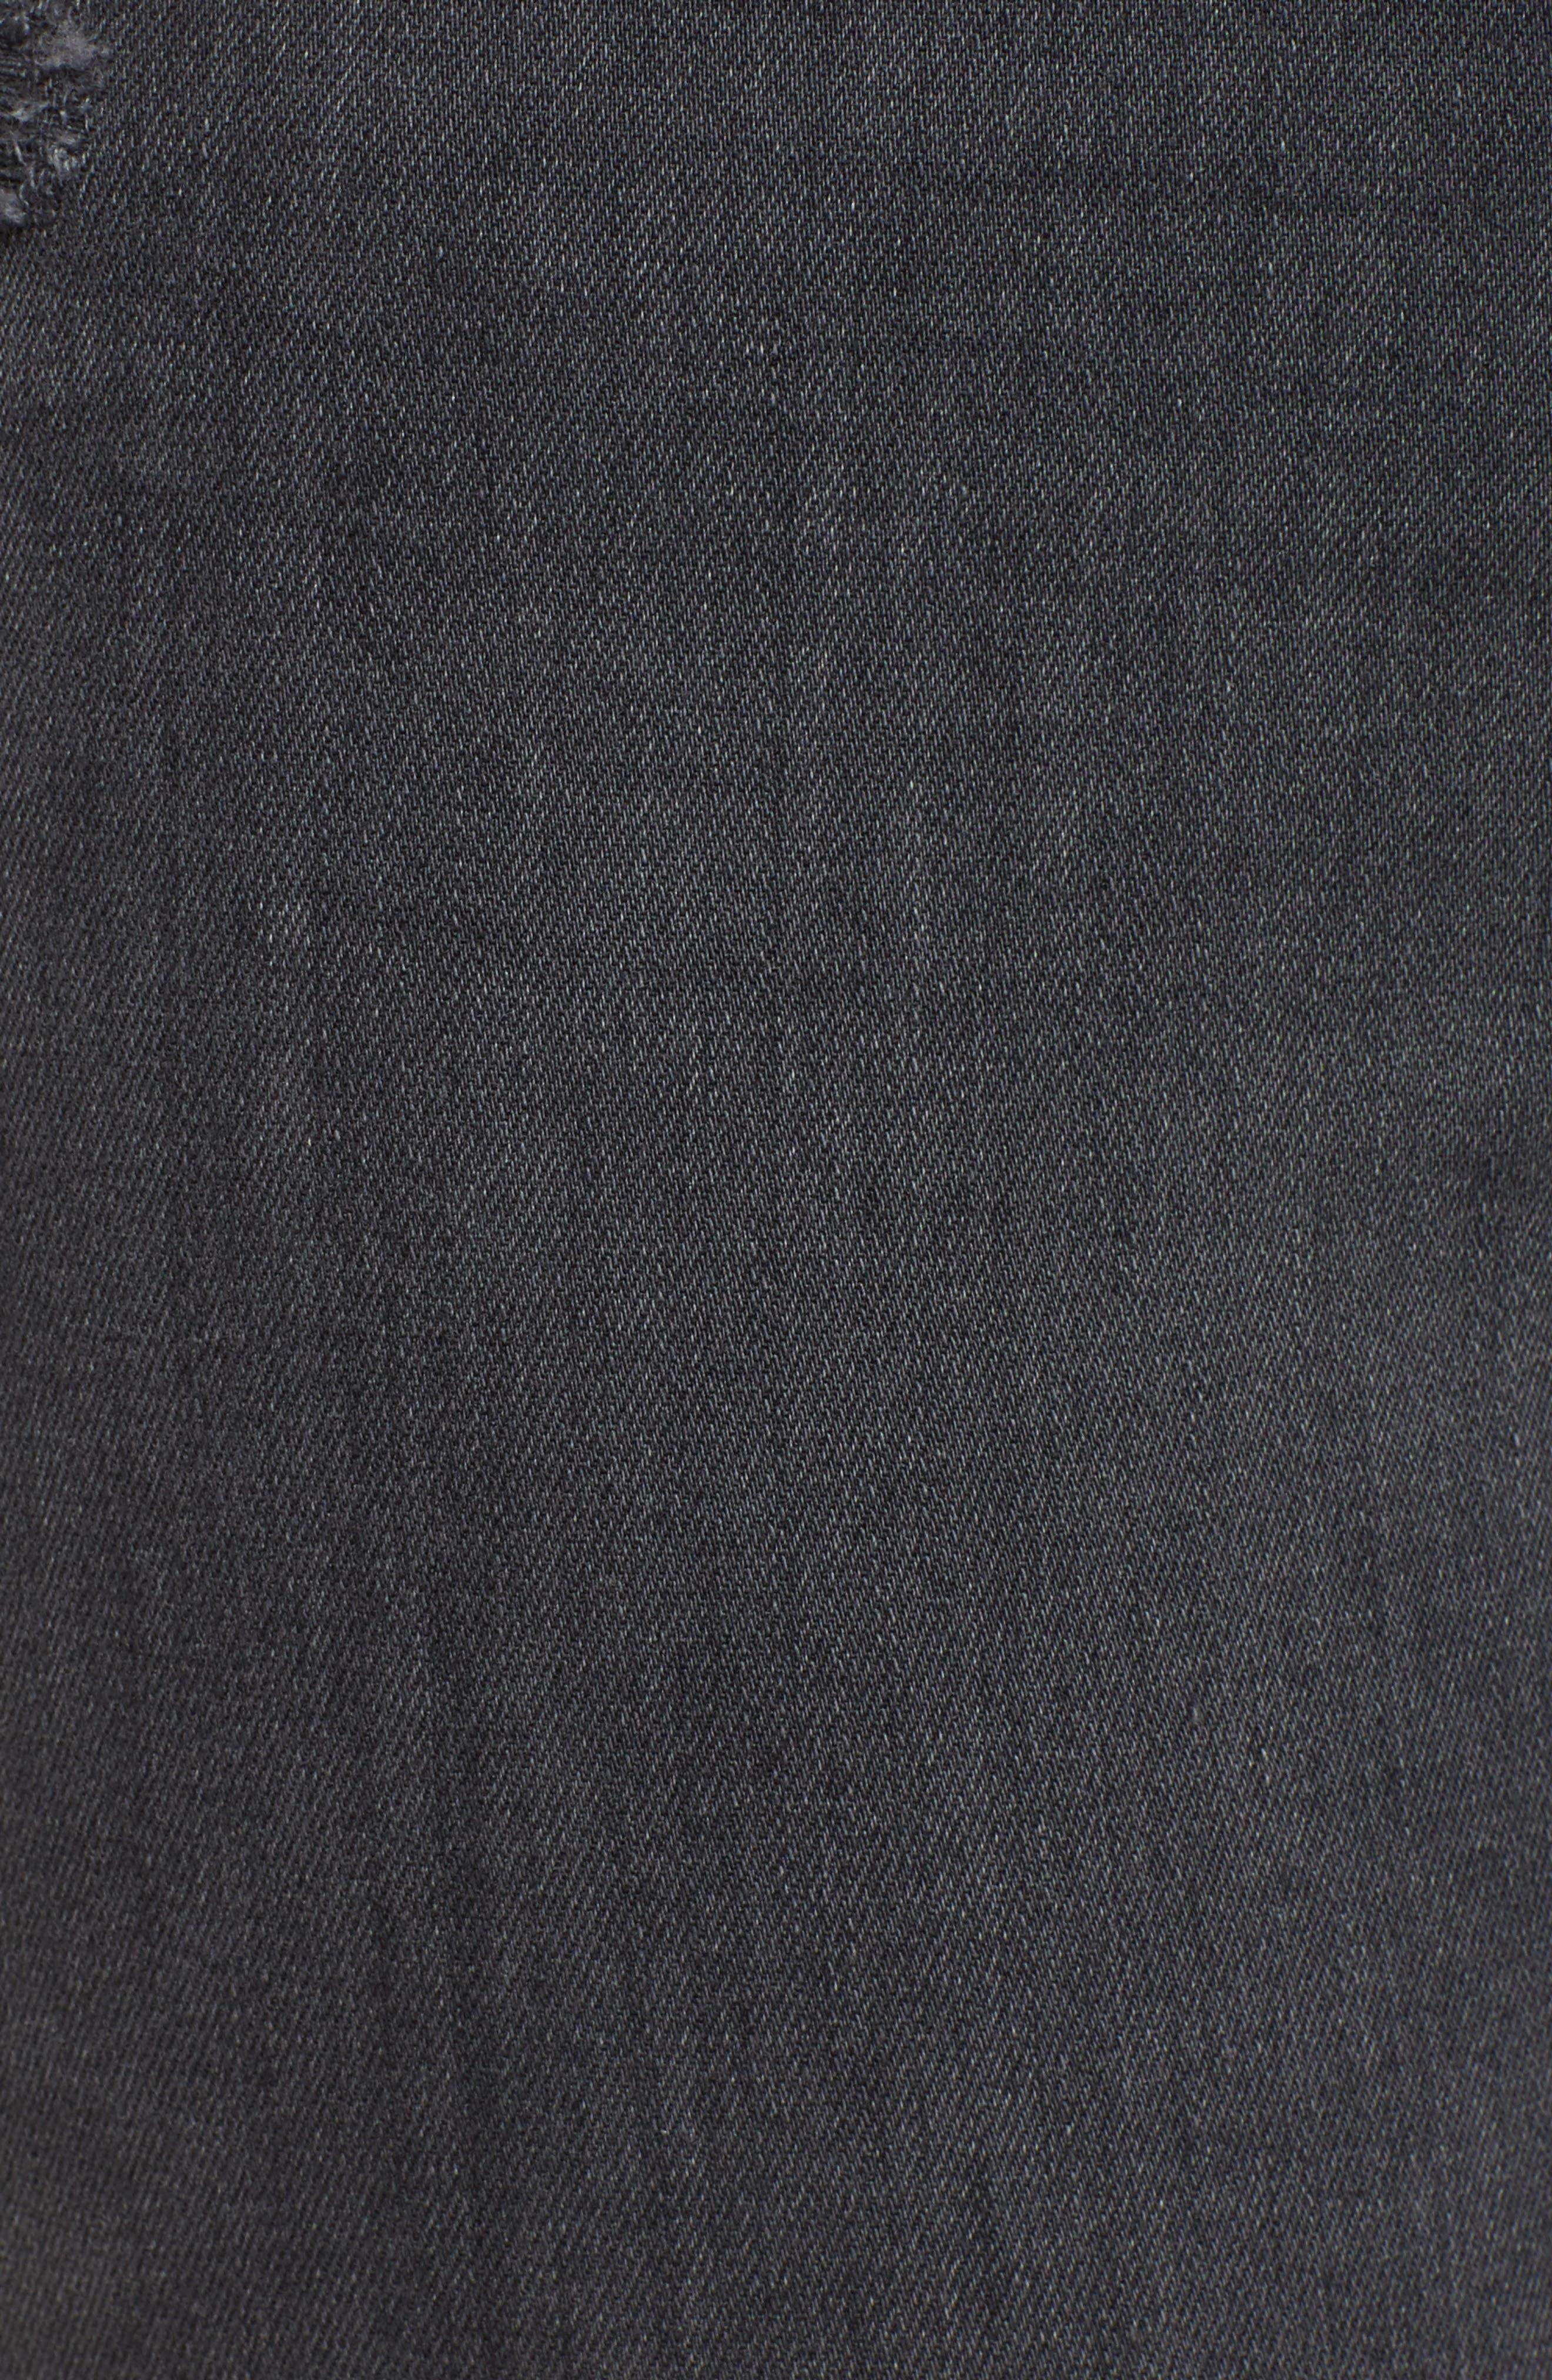 'The Legging' Ankle Super Skinny Jeans,                             Alternate thumbnail 19, color,